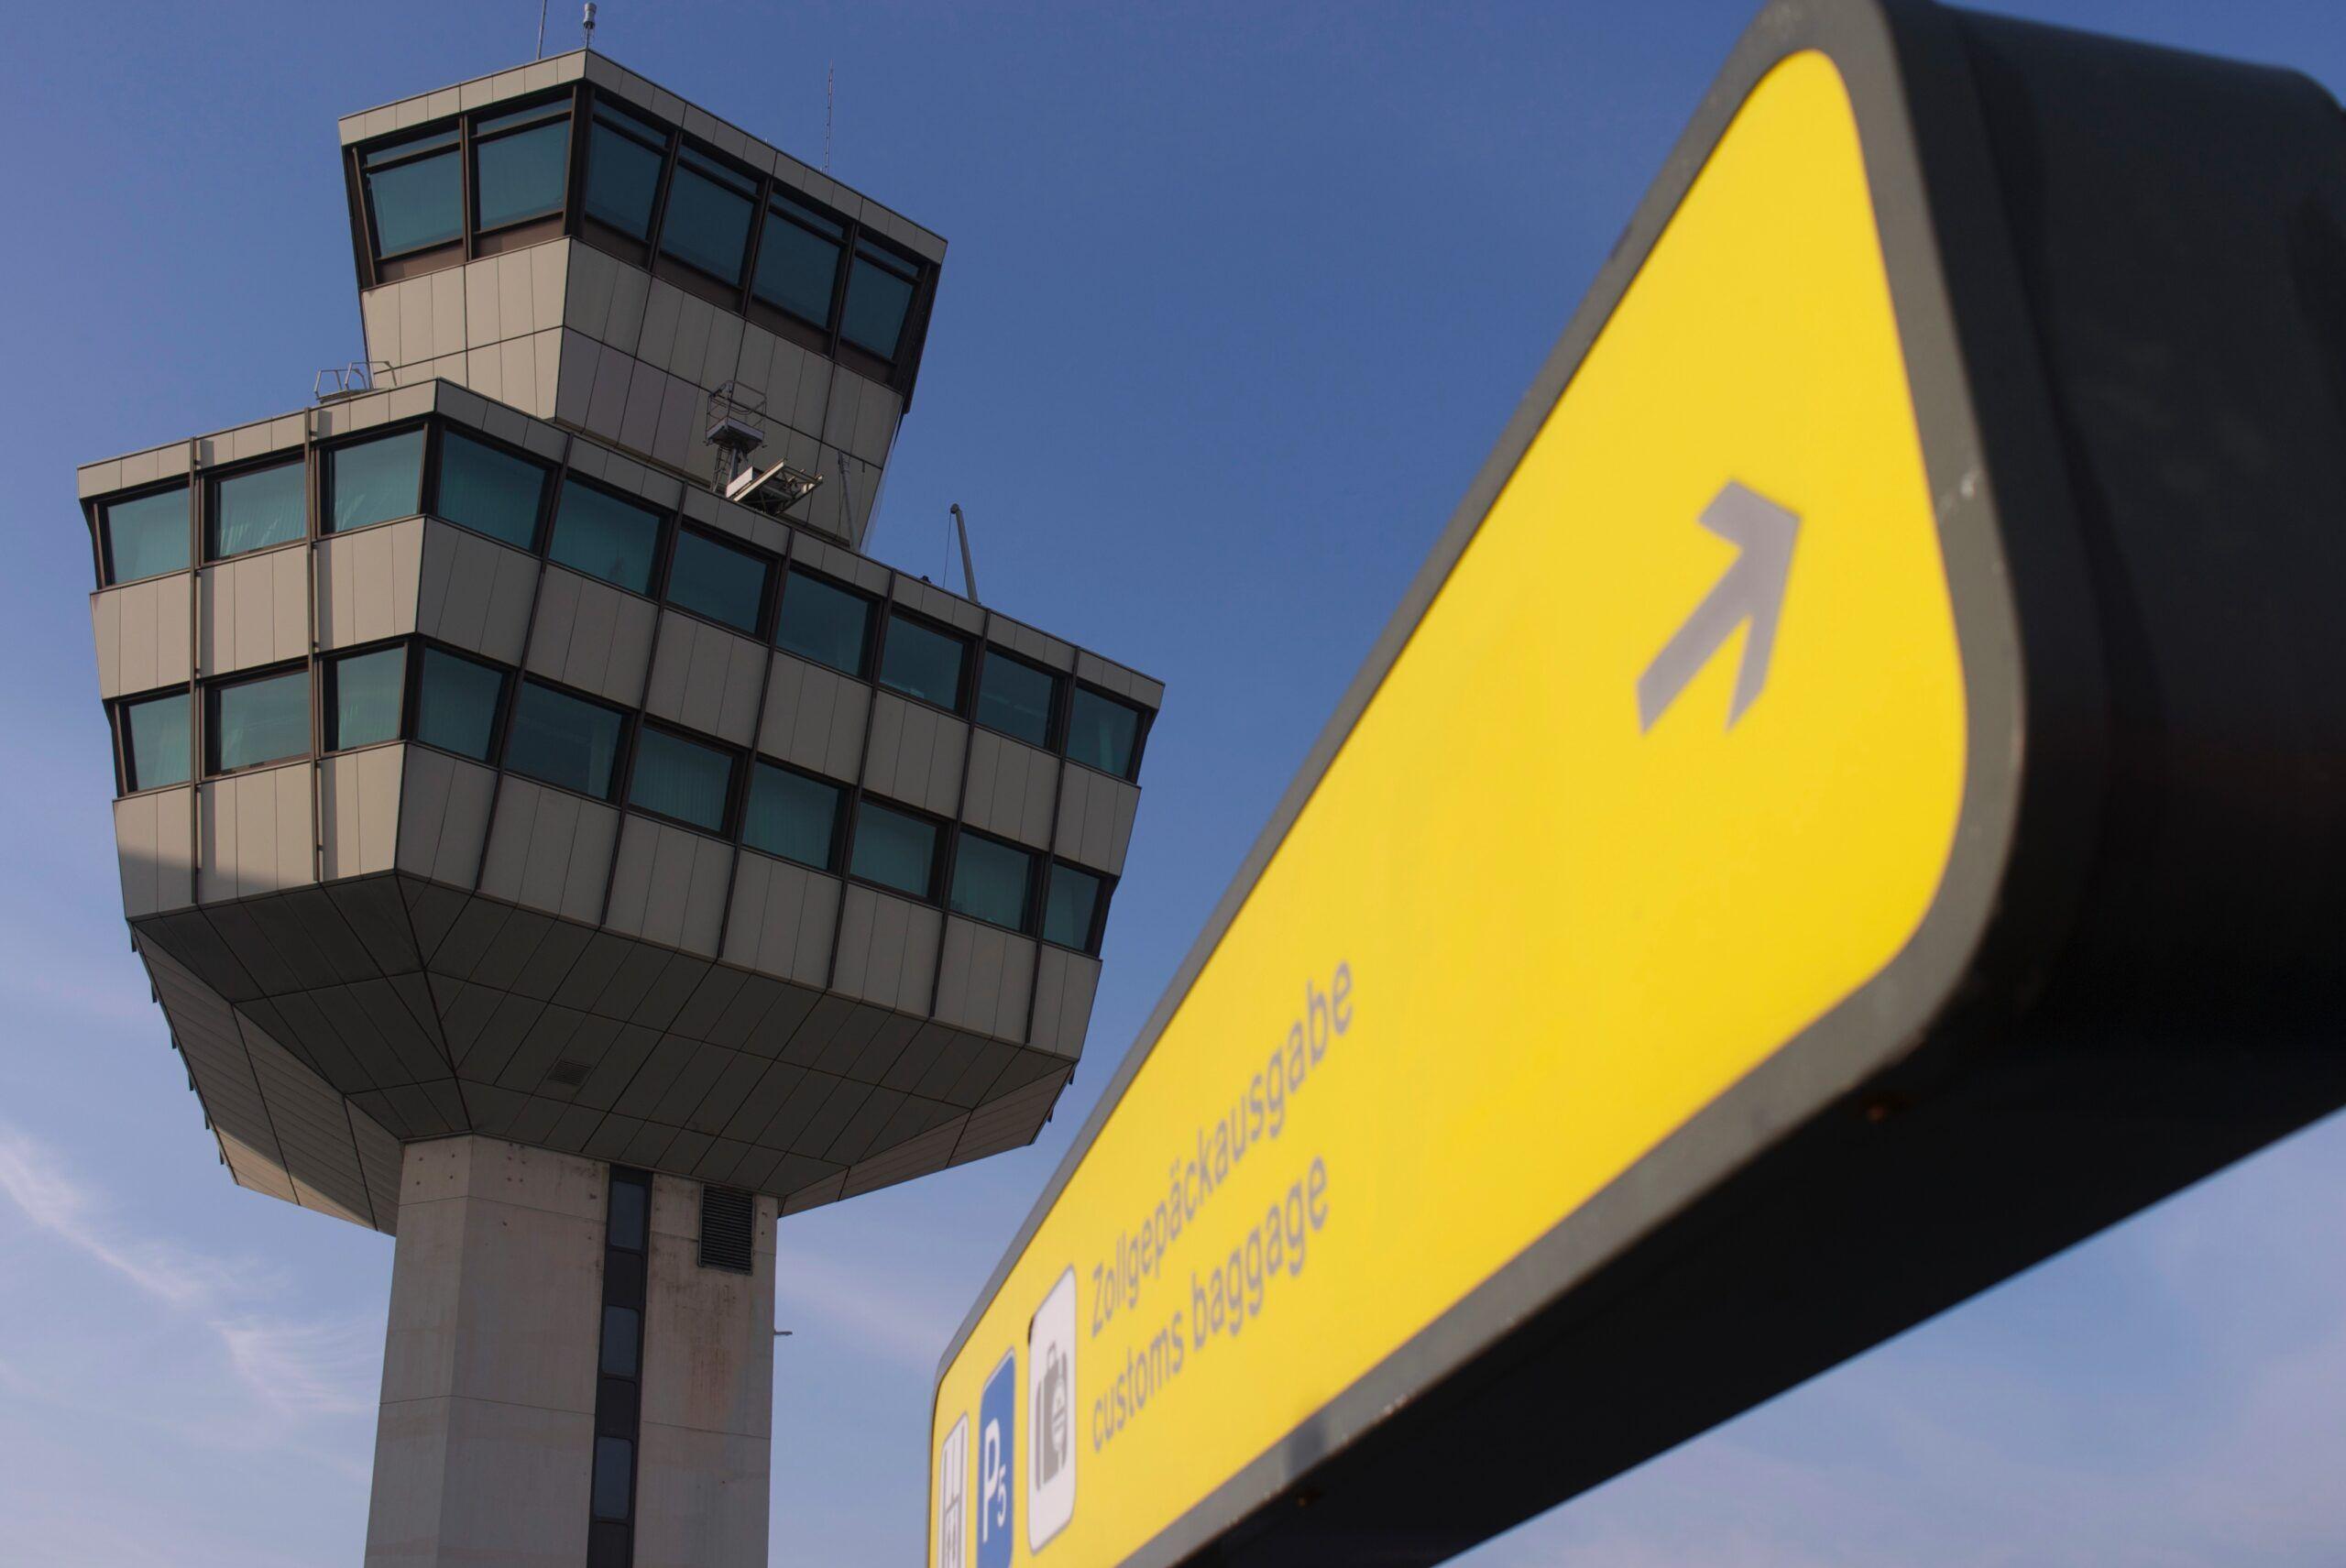 Tegel Airport Flughafen TXL